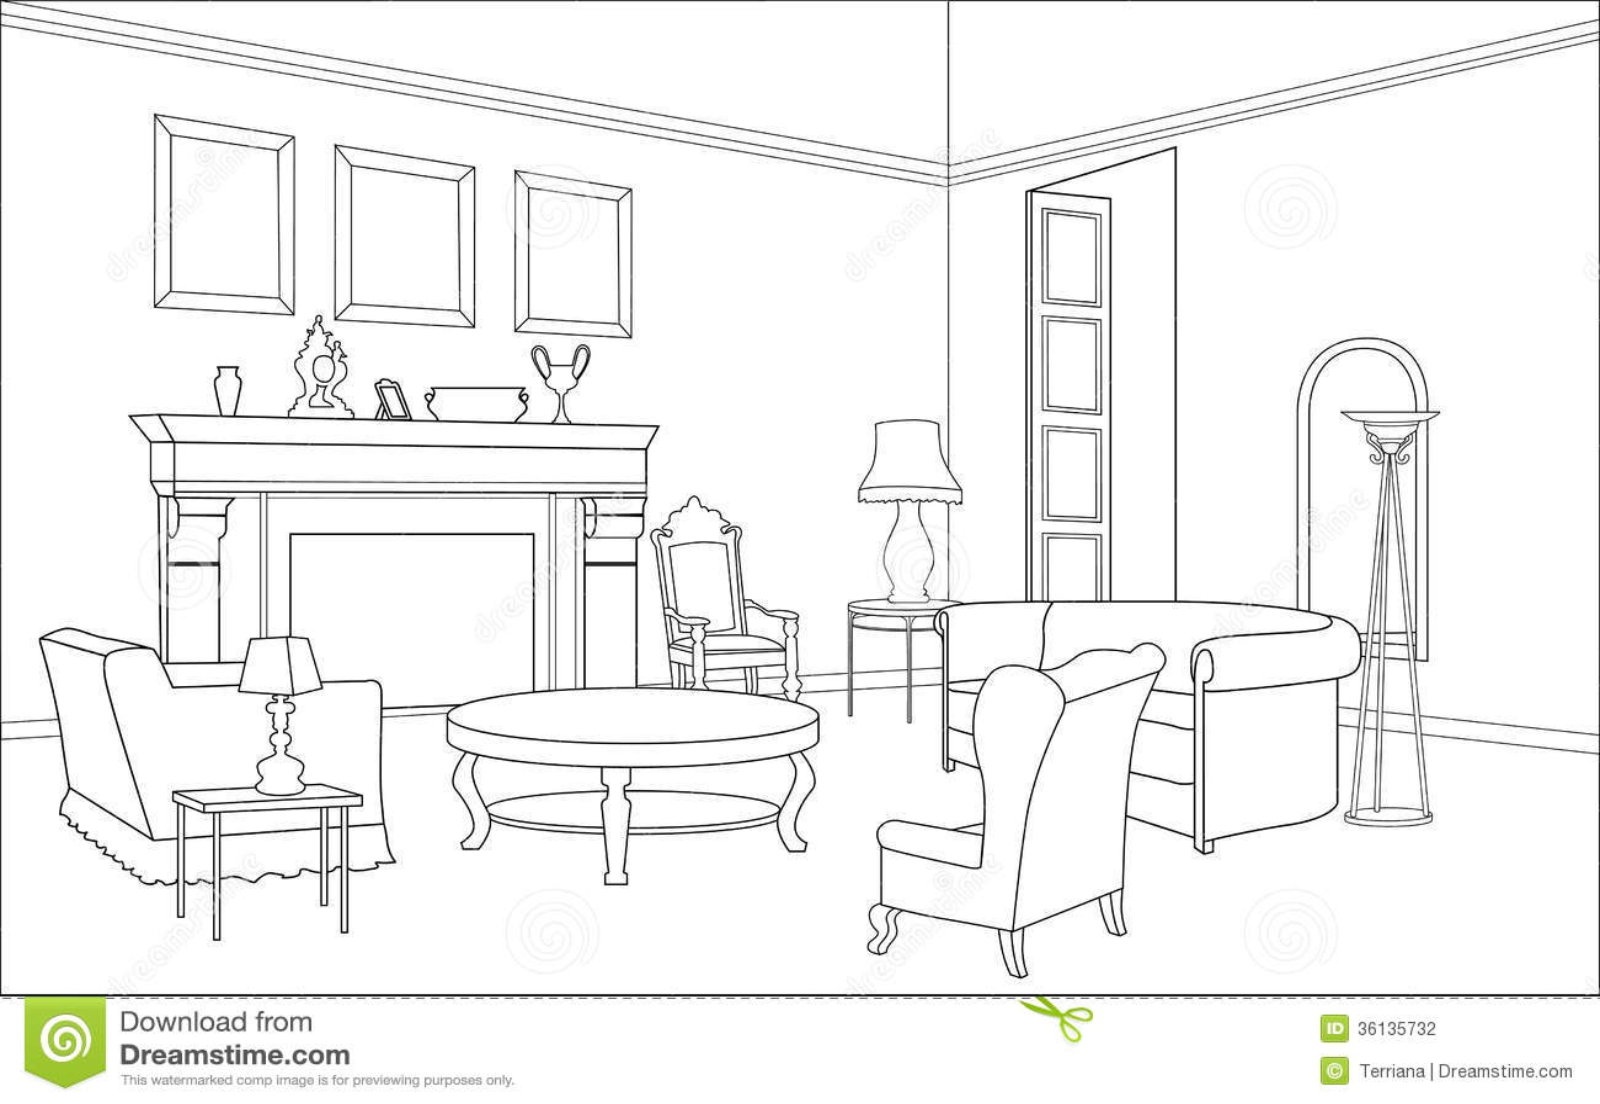 salon mit kamin editable m bel innenraum im retrostil stock abbildung illustration von. Black Bedroom Furniture Sets. Home Design Ideas